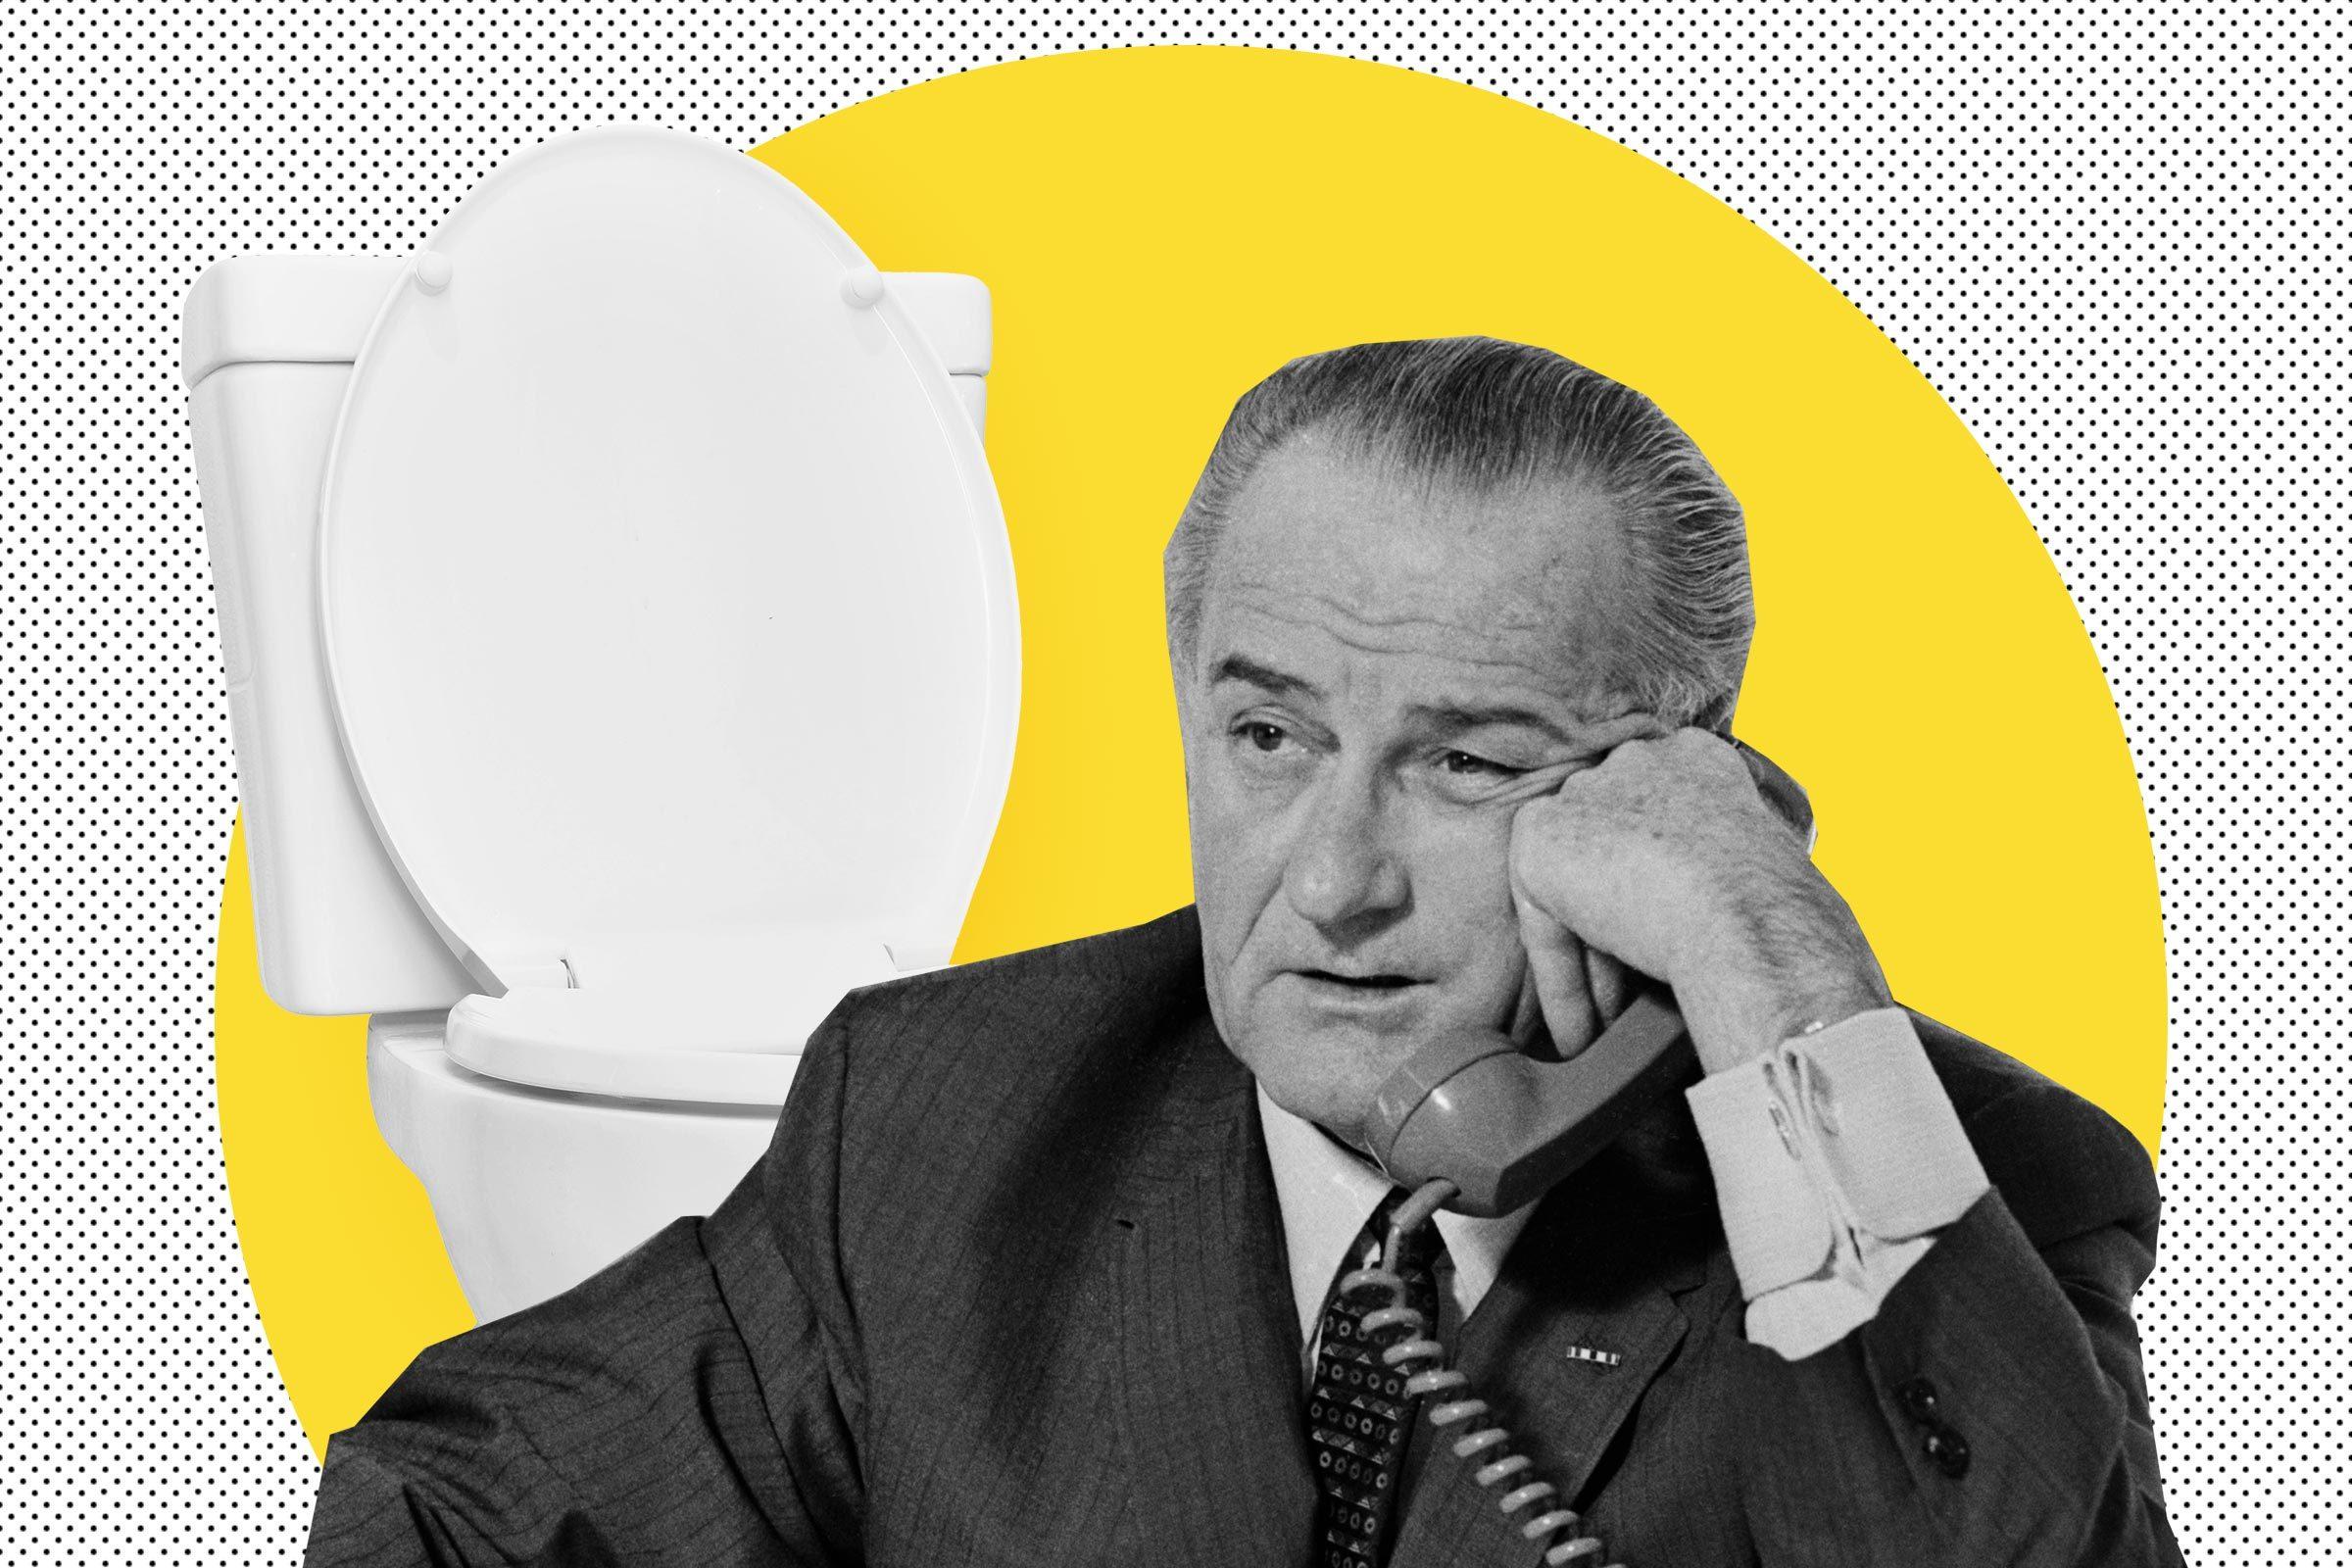 Lyndon B Johnson had meetings on toilet